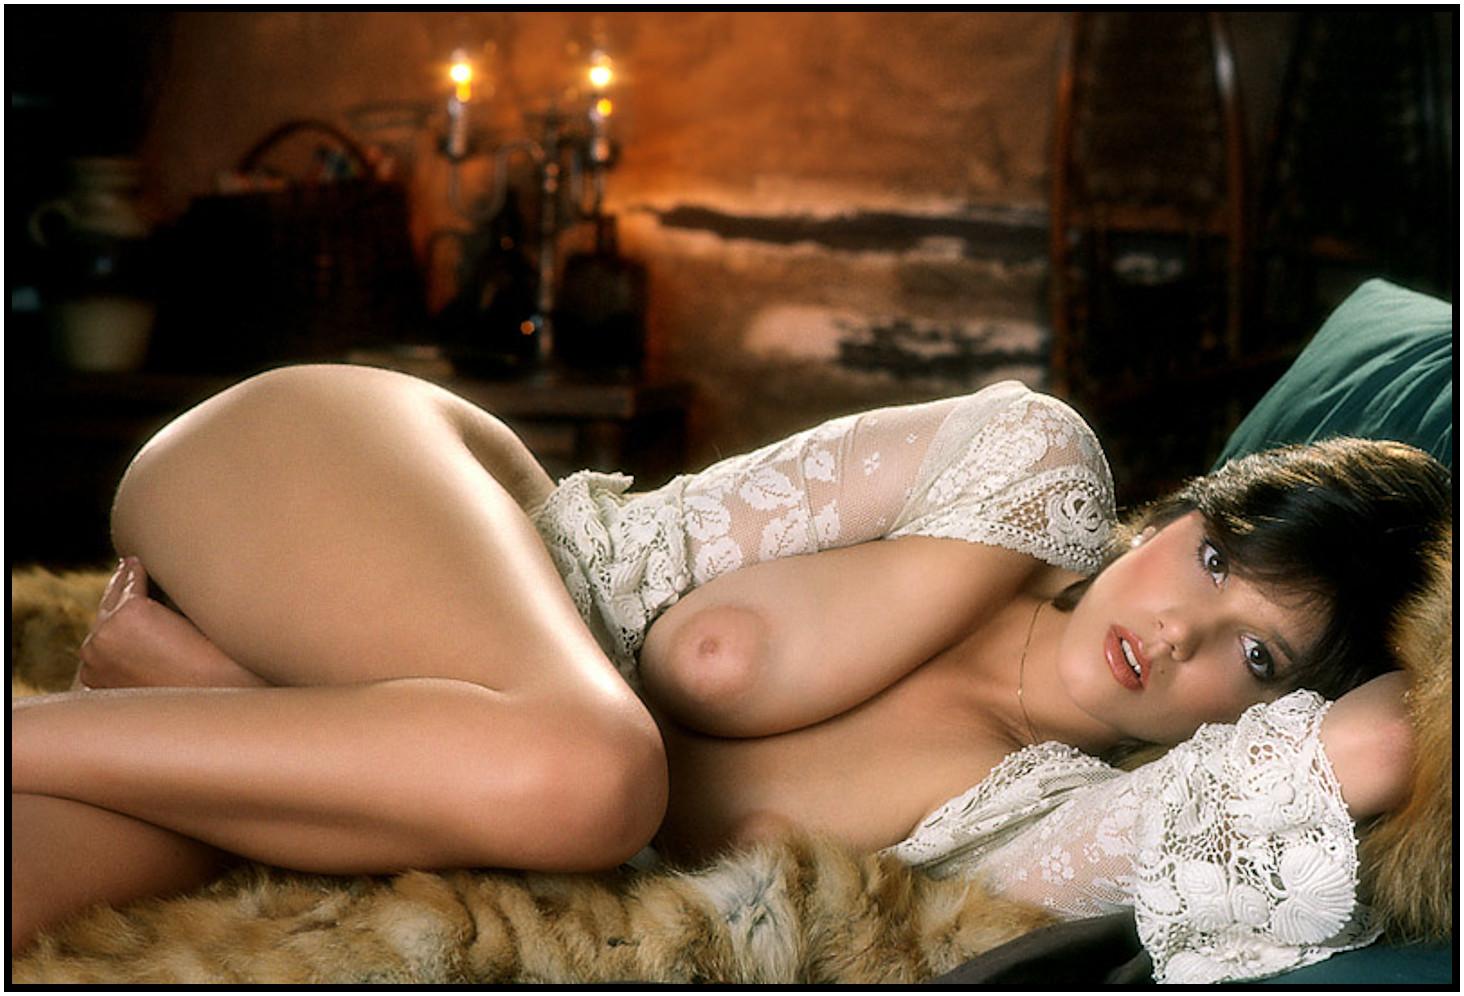 Nude Playboy Girls Vintage Pics